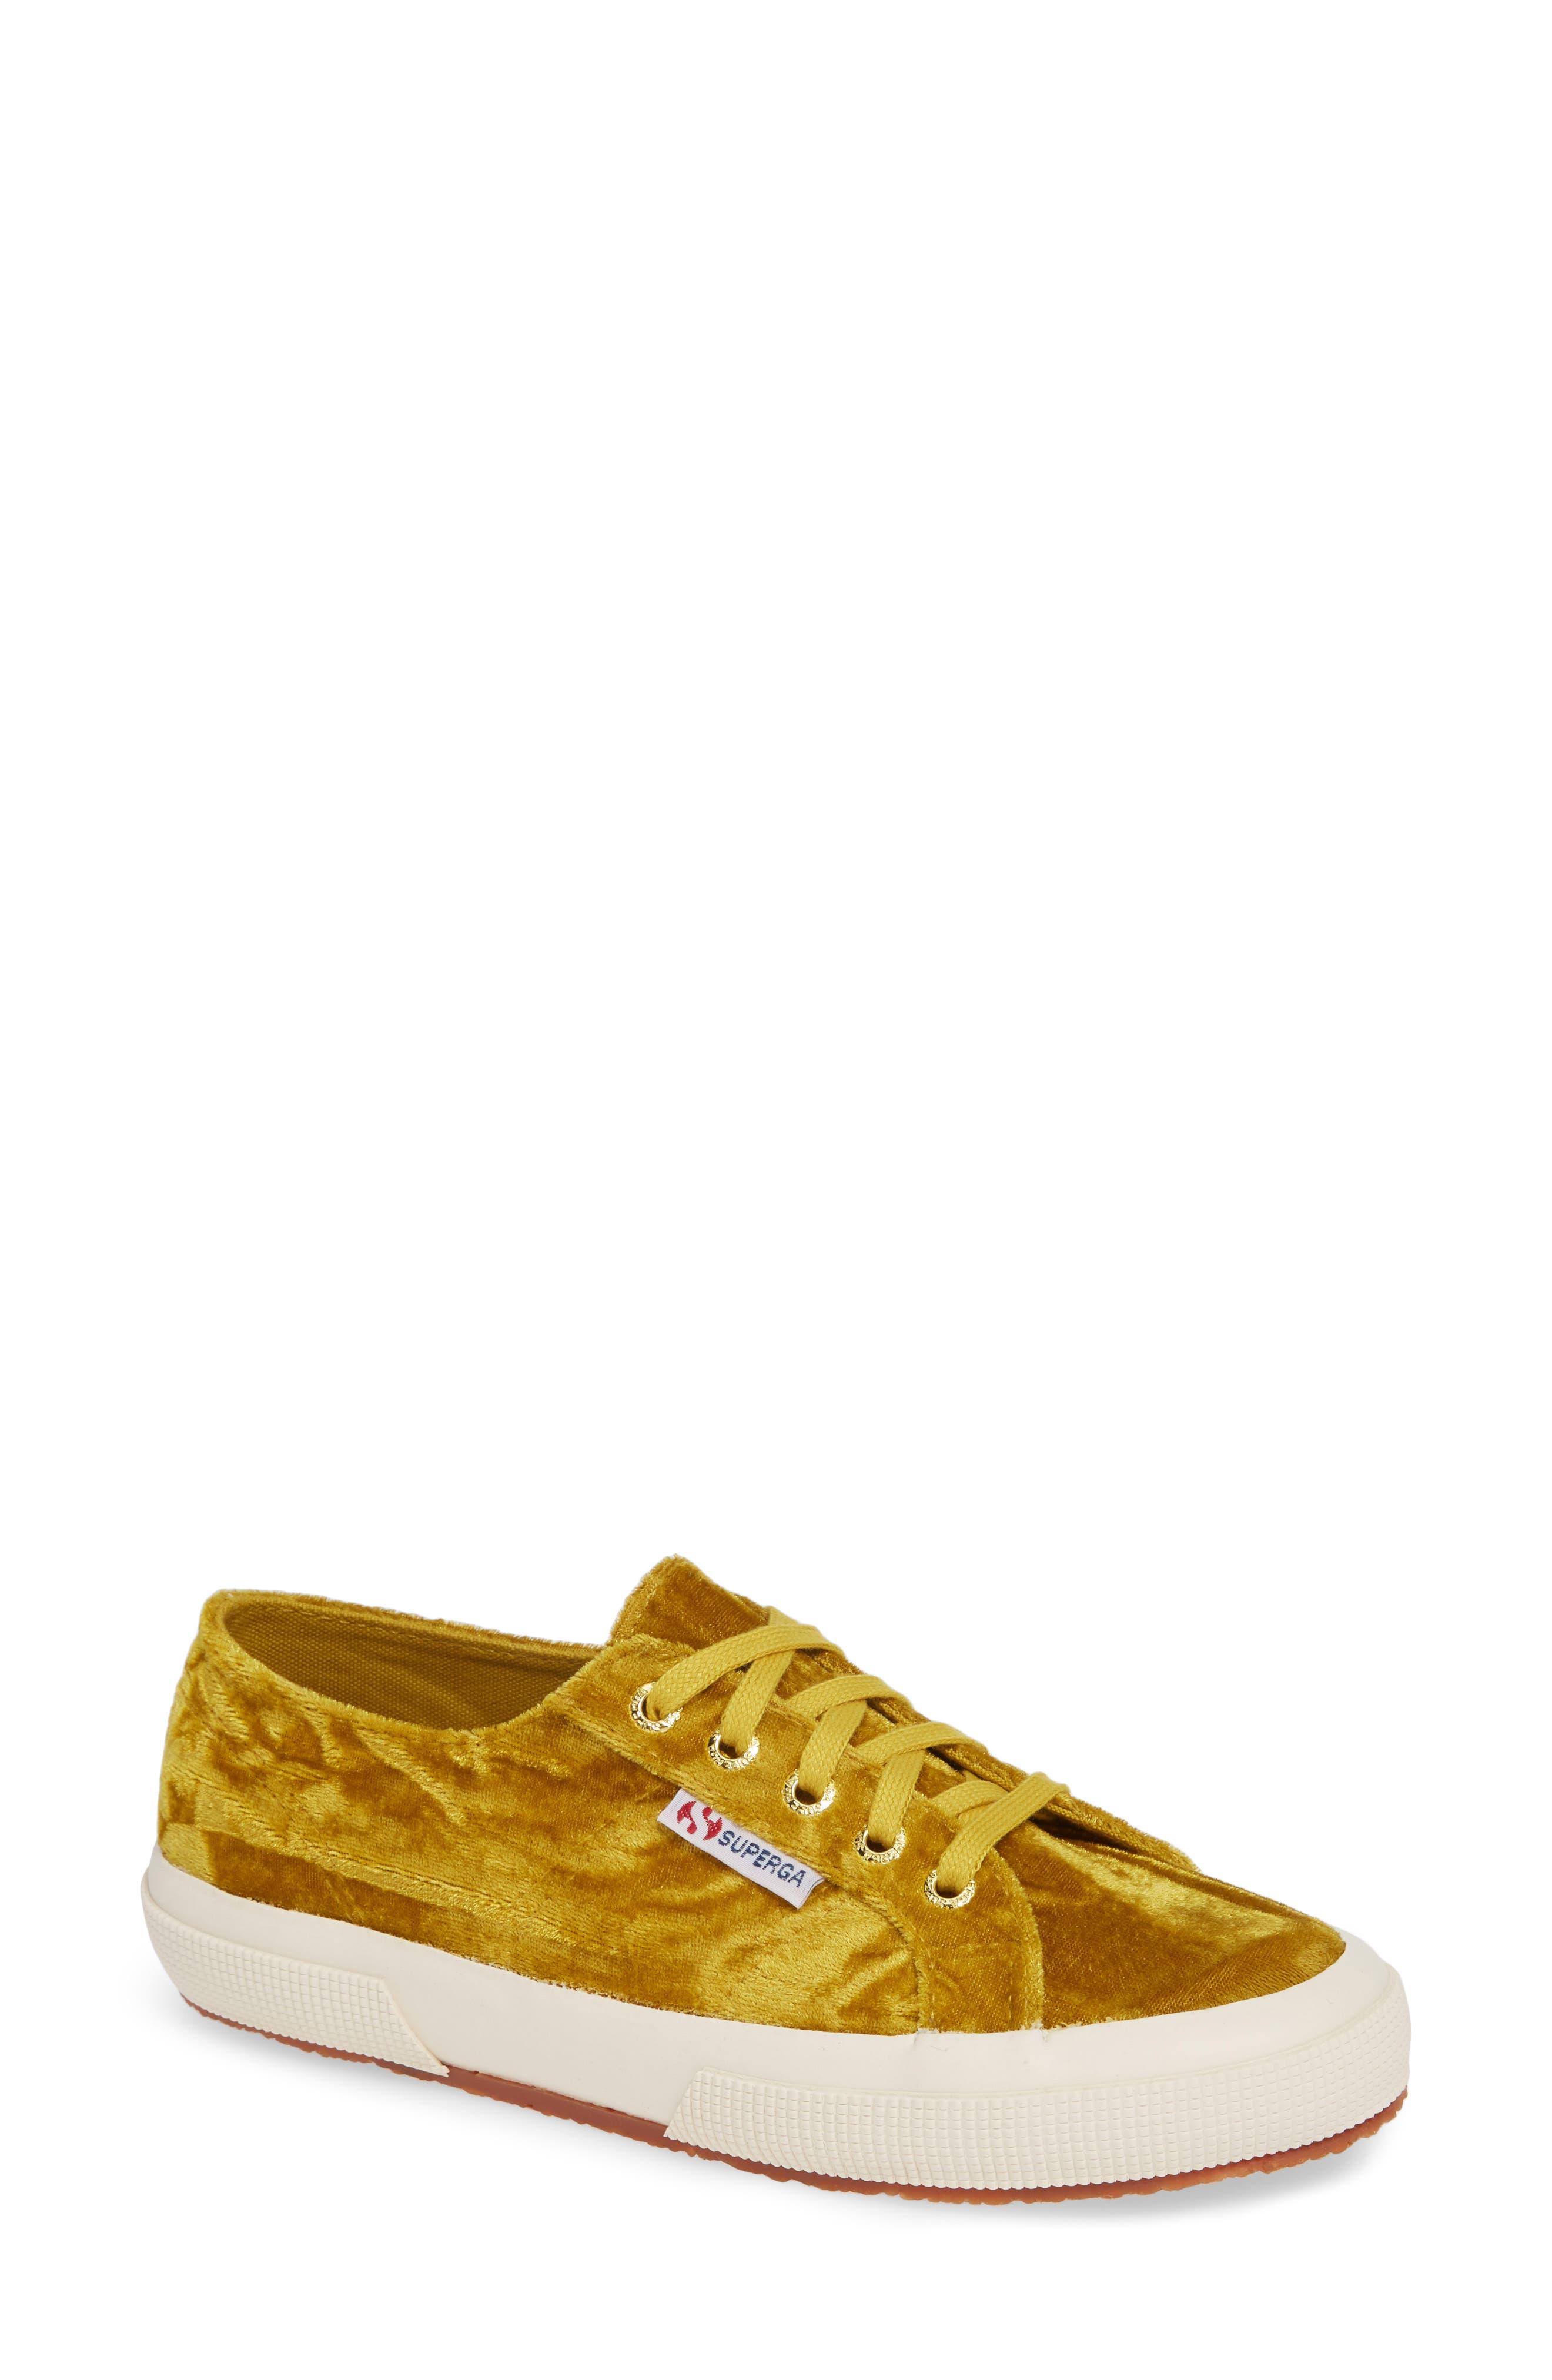 SUPERGA,                             2750 Sneaker,                             Main thumbnail 1, color,                             700